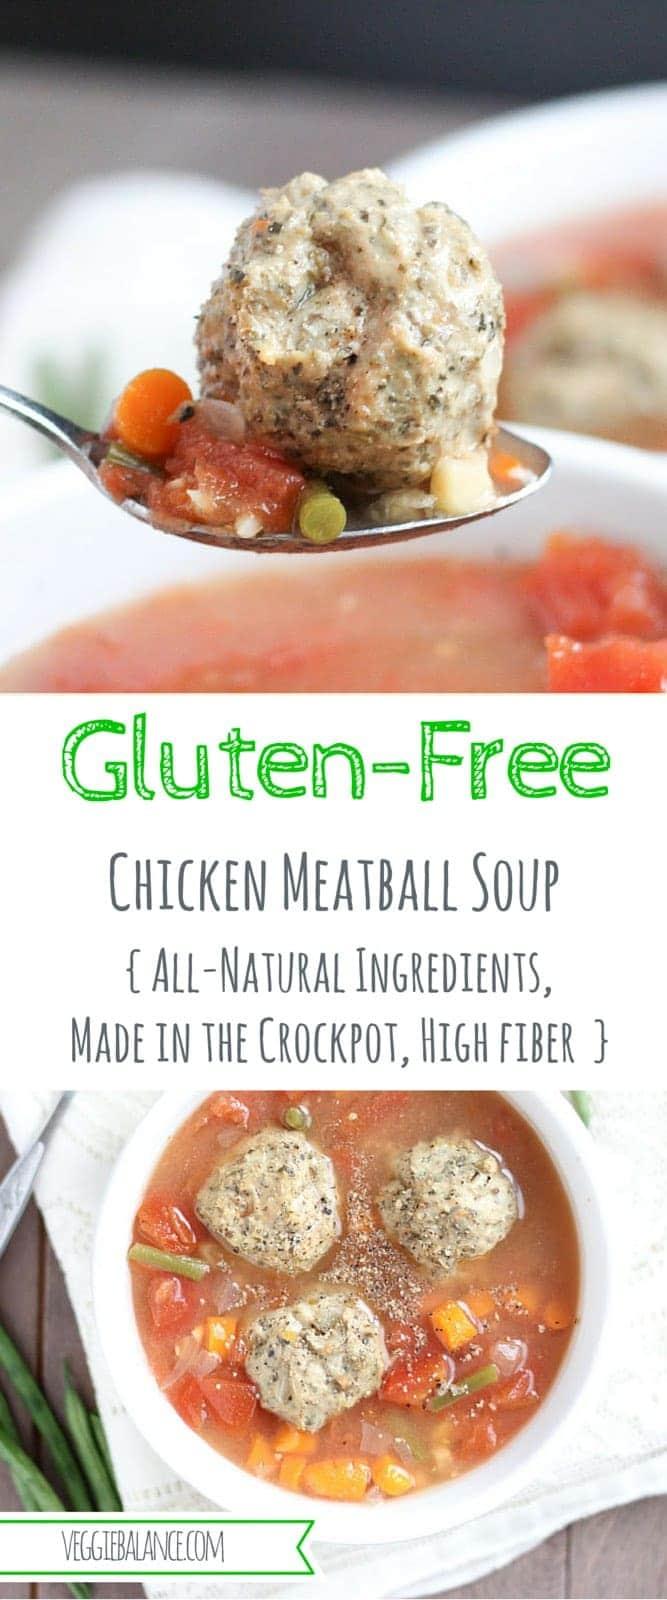 Chicken Meatball Soup {Gluten-Free} - Veggiebalance.com